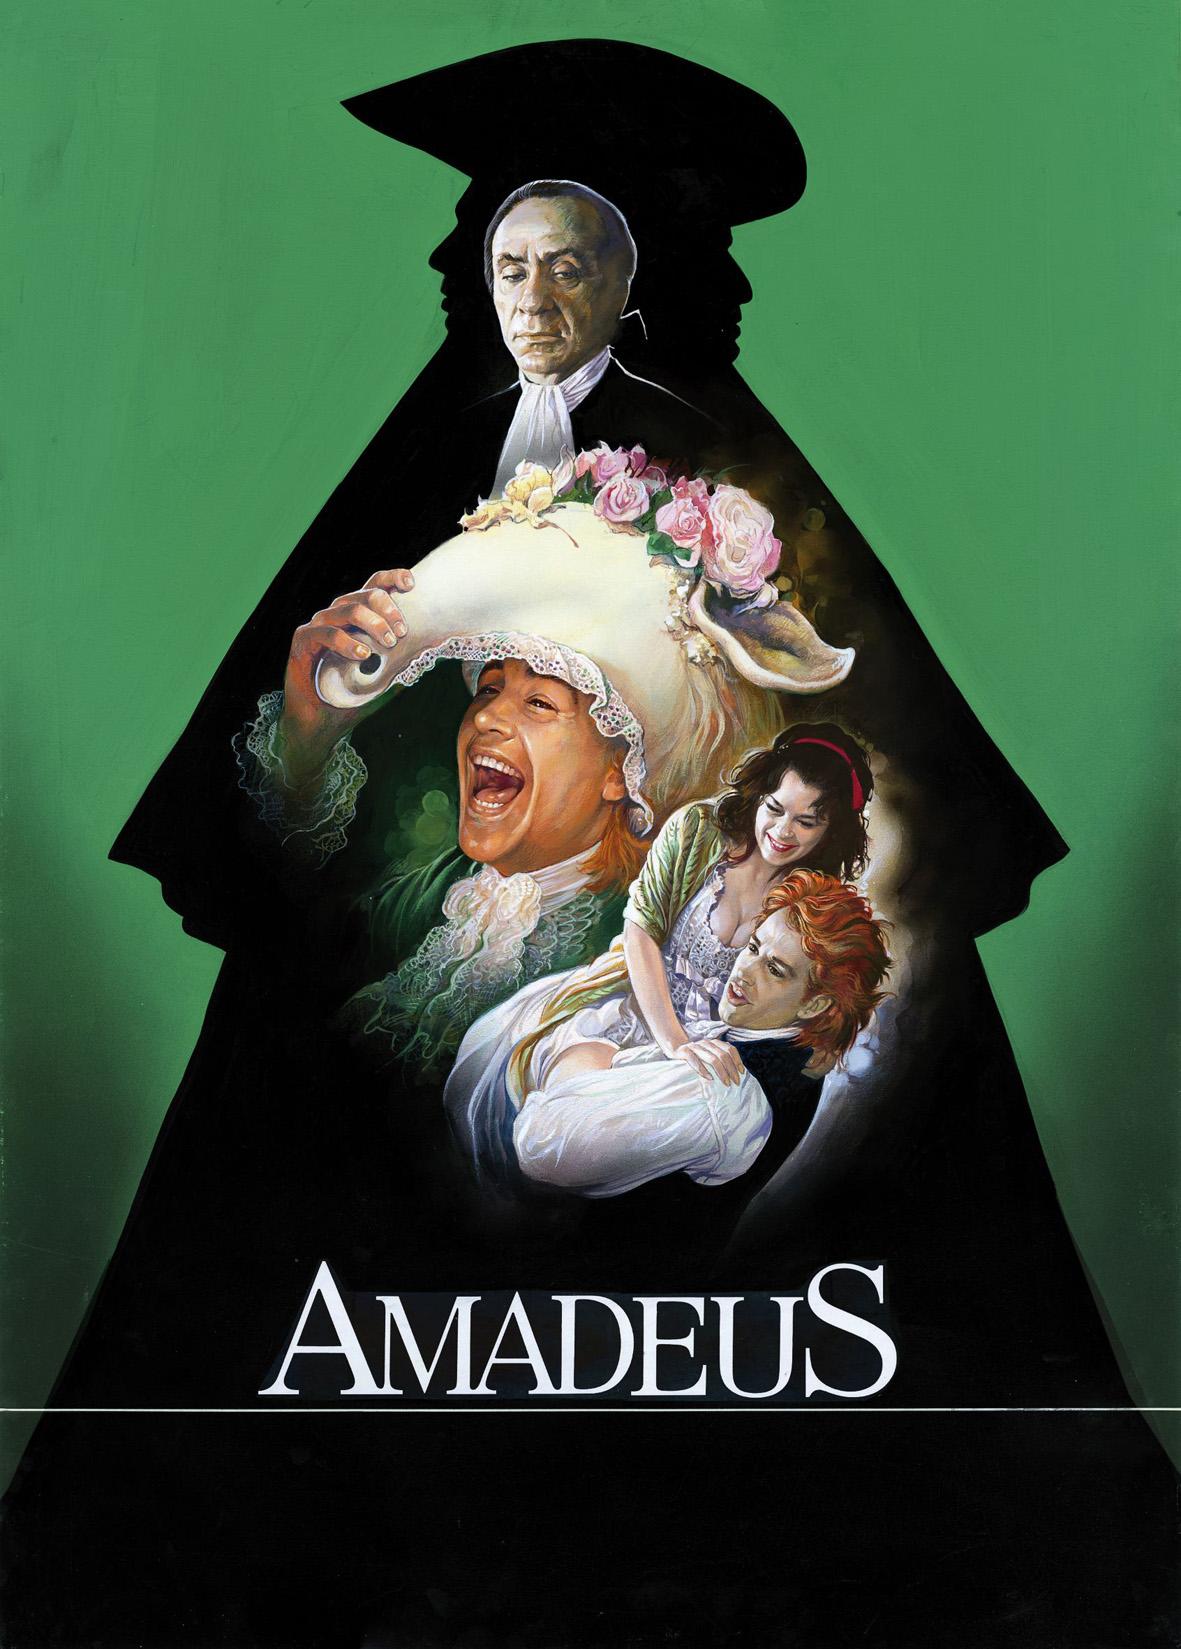 Amadeus, 1984, USA, Drammatico, Originale. Archivio Casaro